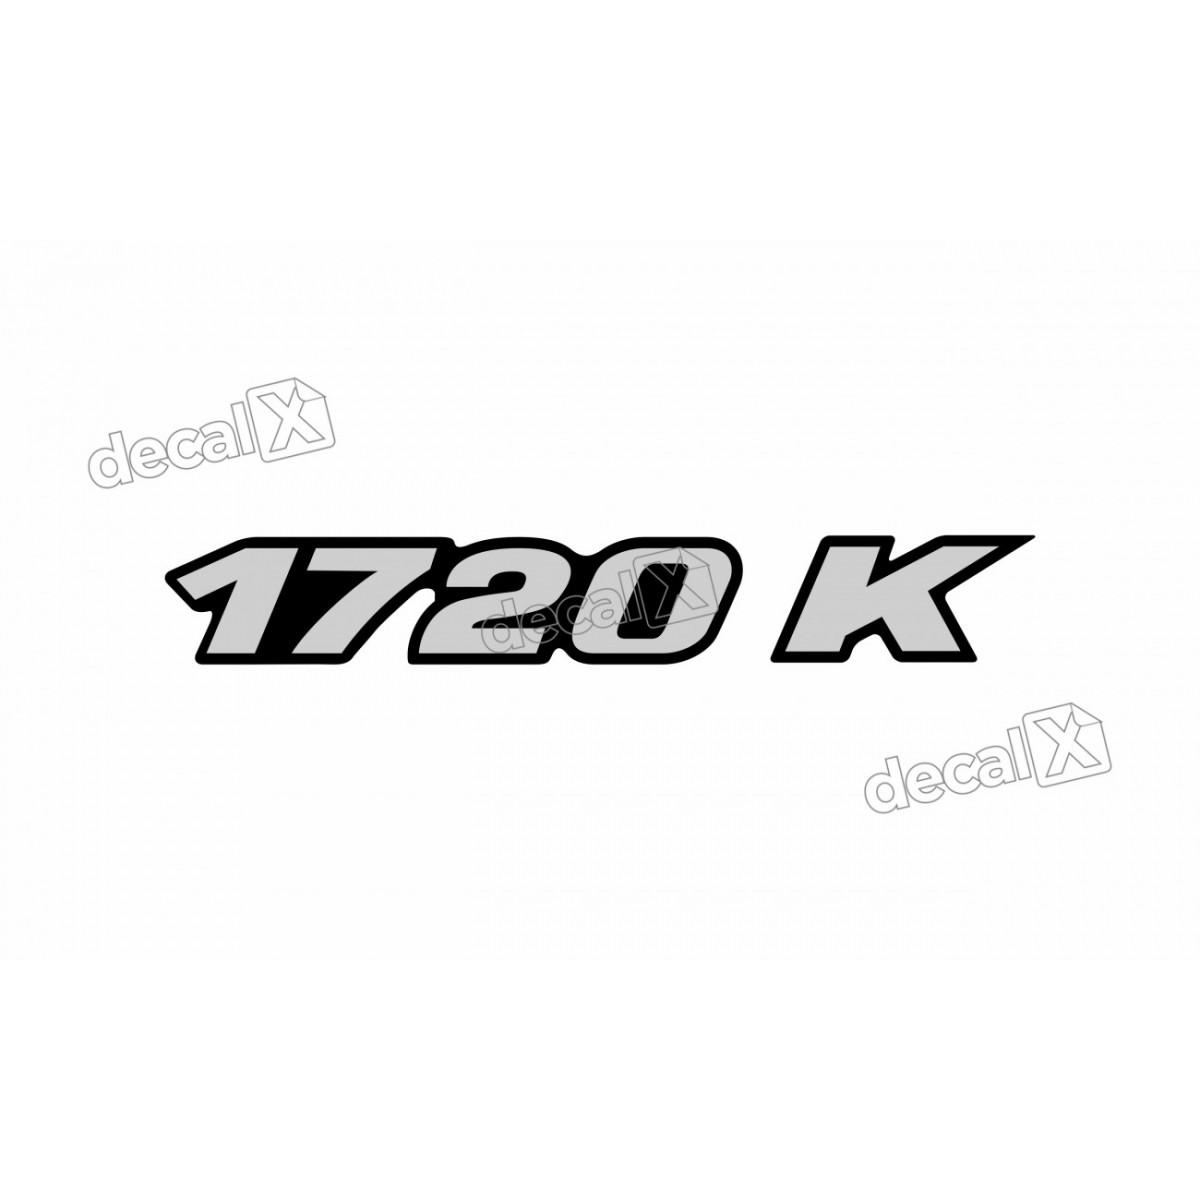 Adesivo Emblema Resinado Mercedes 1720 K Cm59 Decalx